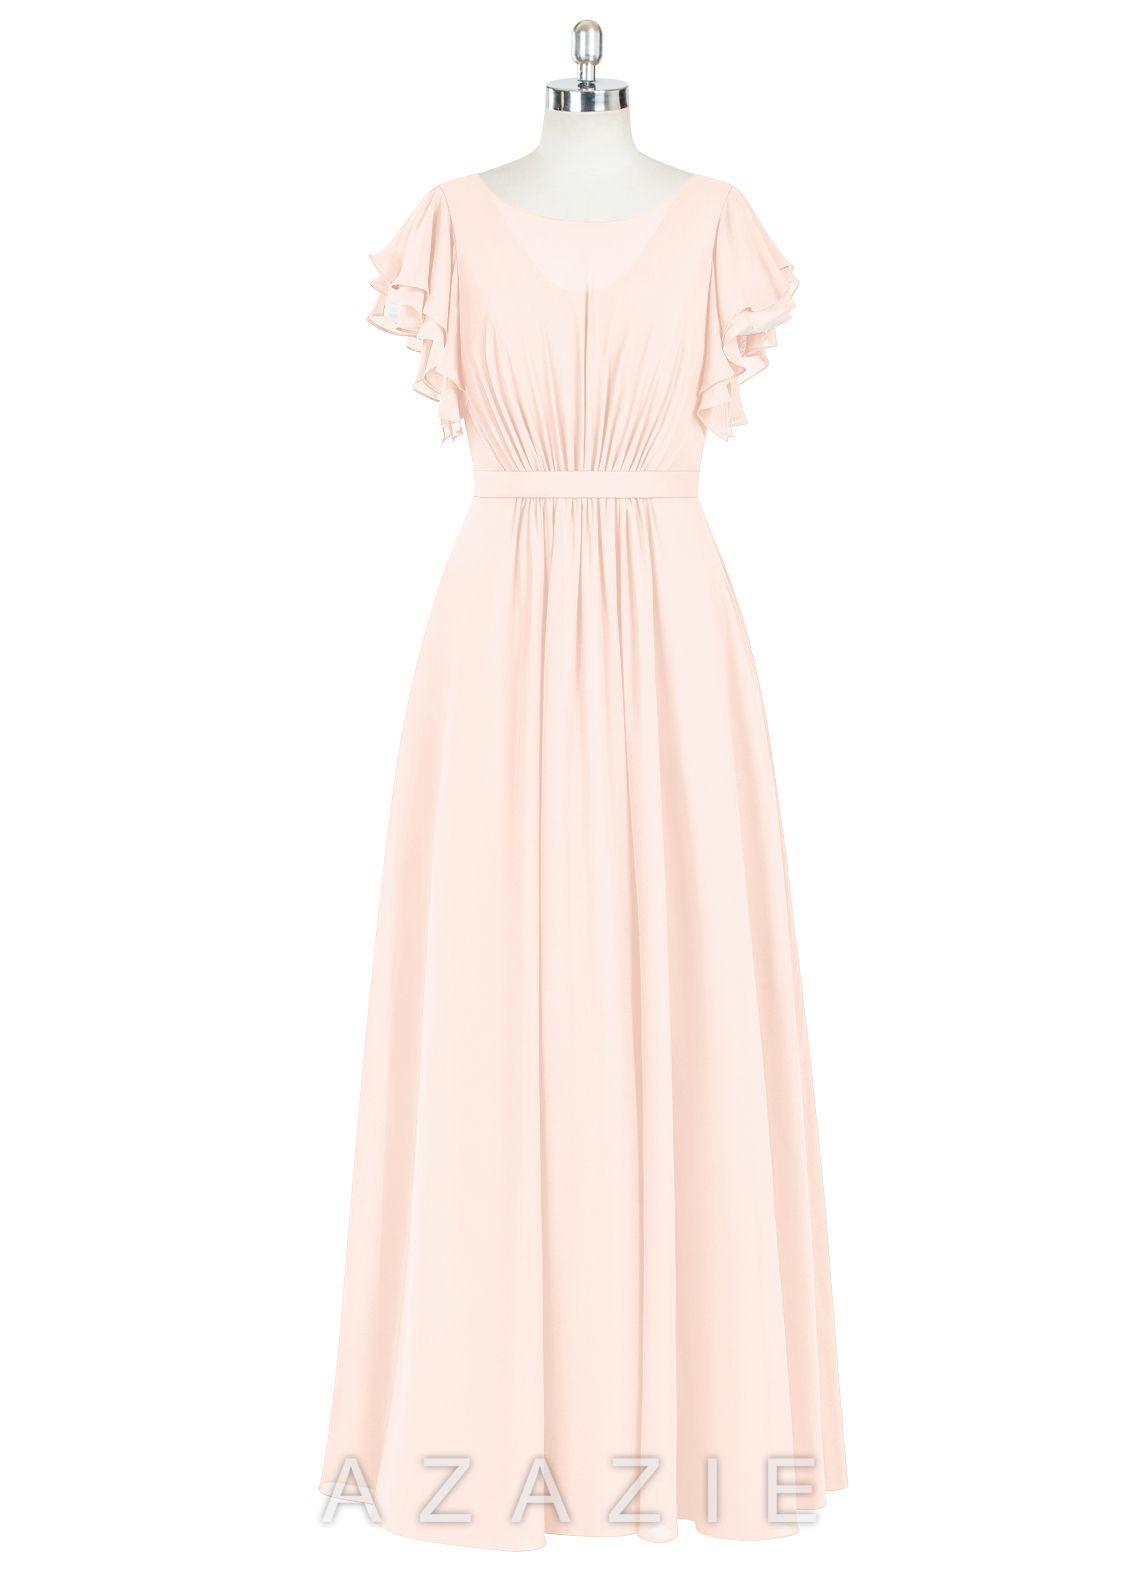 Azazie daphne modest bridesmaid dresses azazie modest